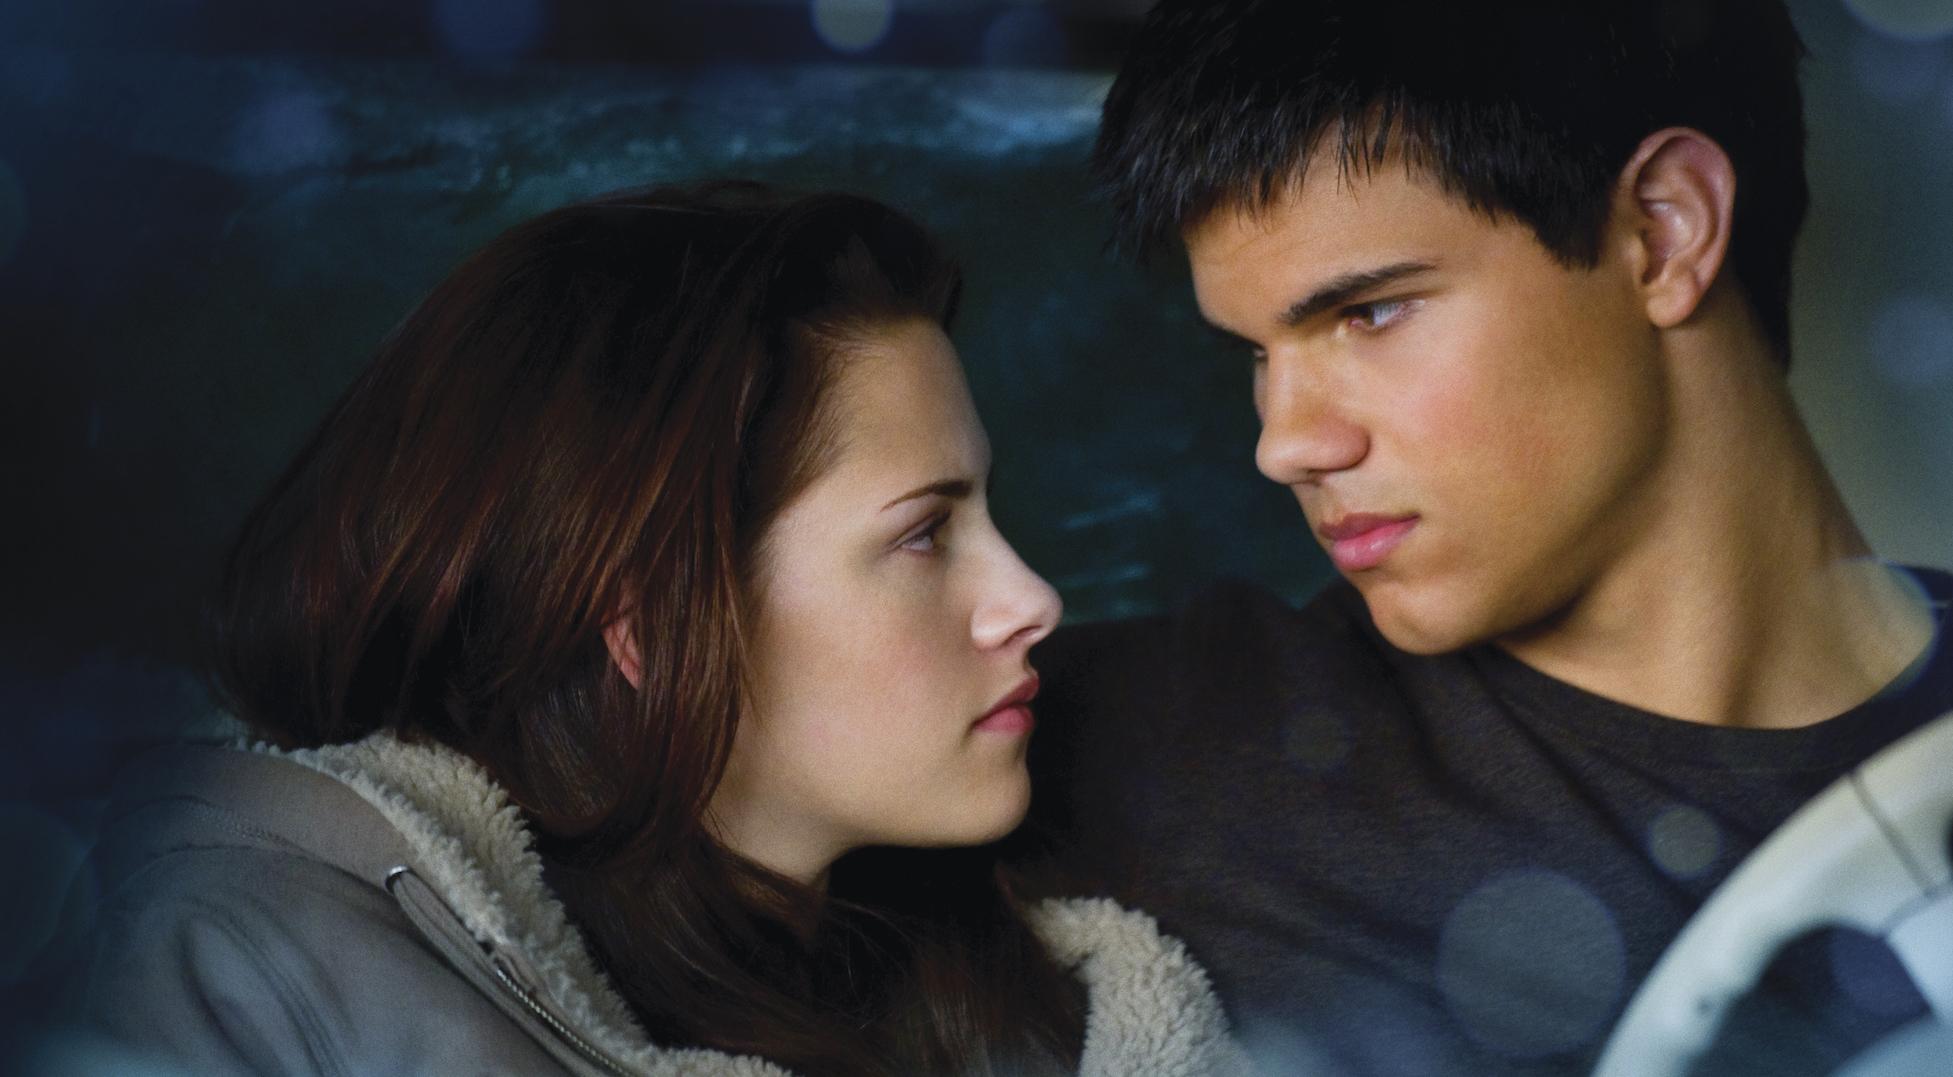 Bella Swan (Kristen Stewart) and Jacob Black (Taylor Lautner) in 'New Moon'